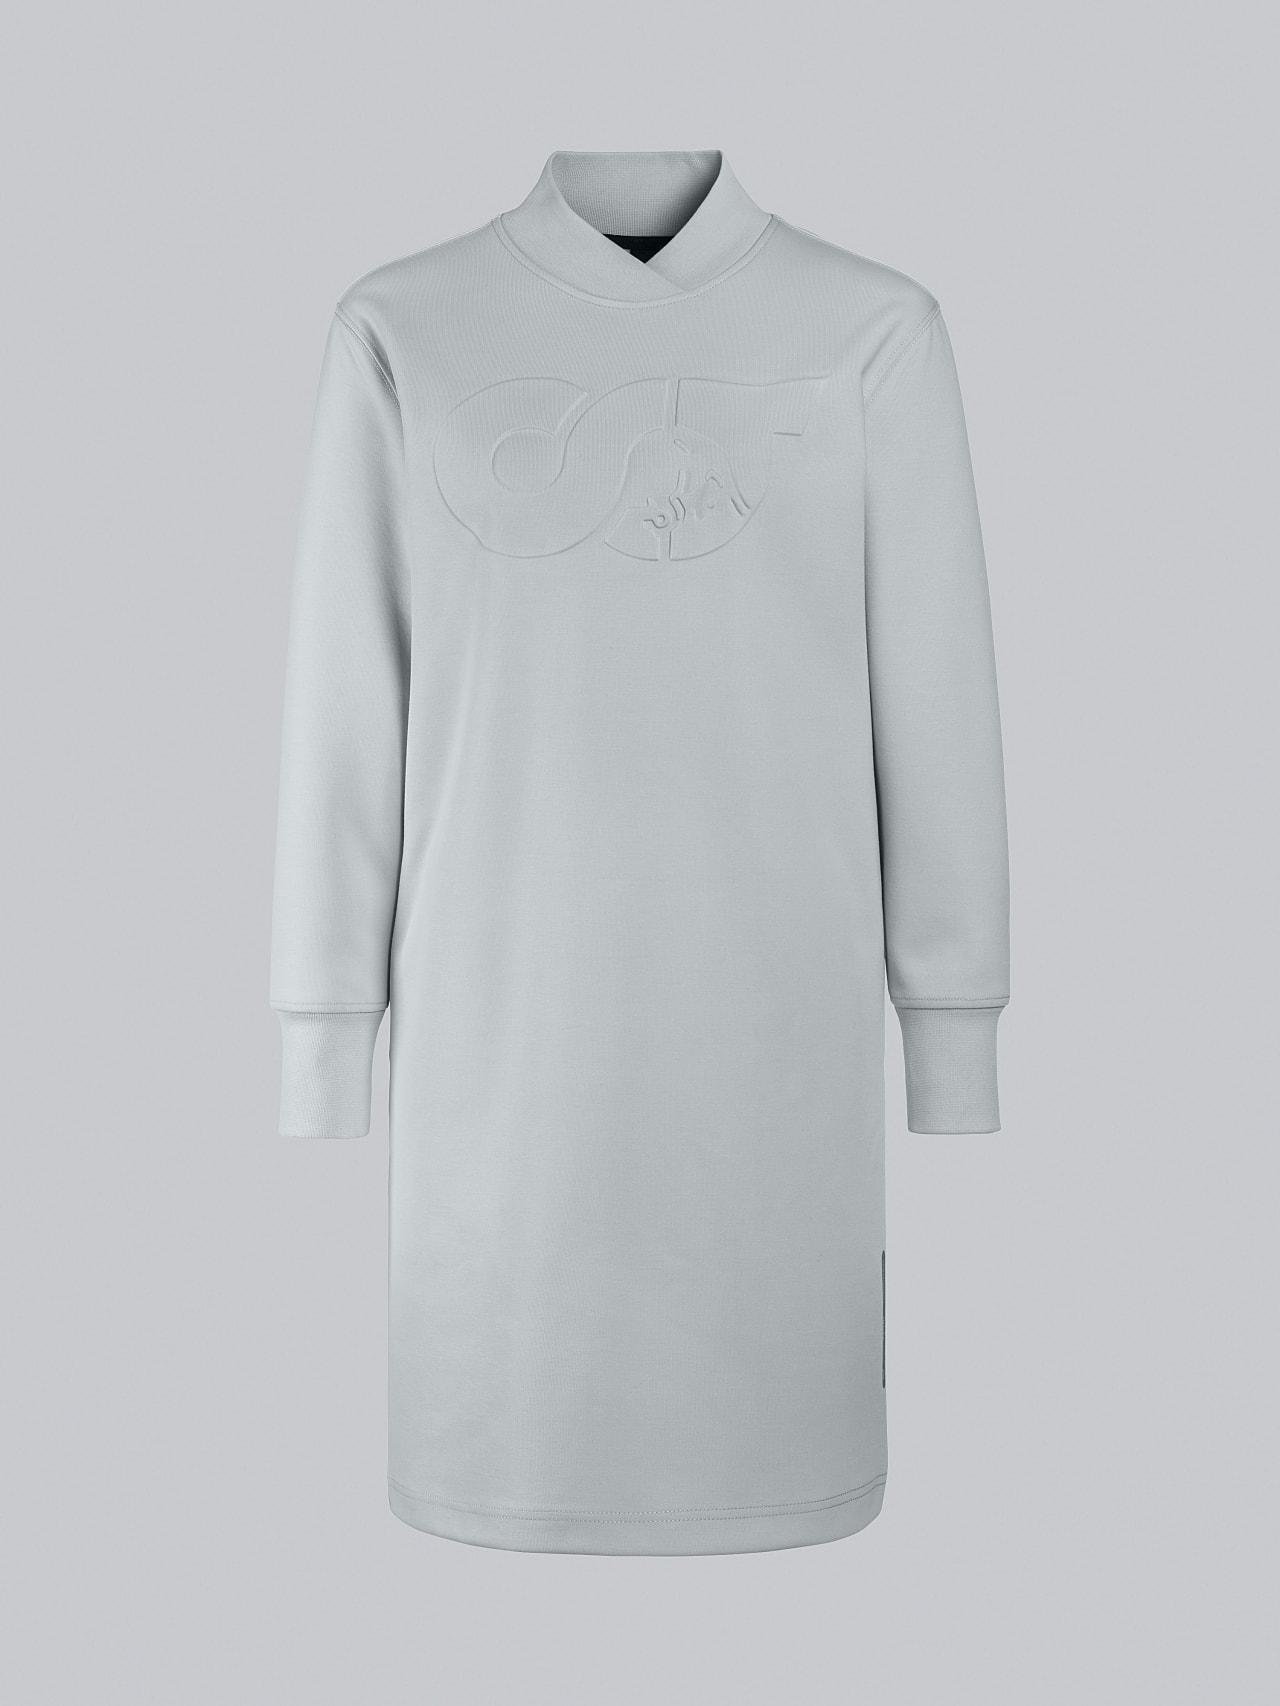 STAR V3.Y5.02 Premium Logo Sweater Dress Pale Blue  Back Alpha Tauri